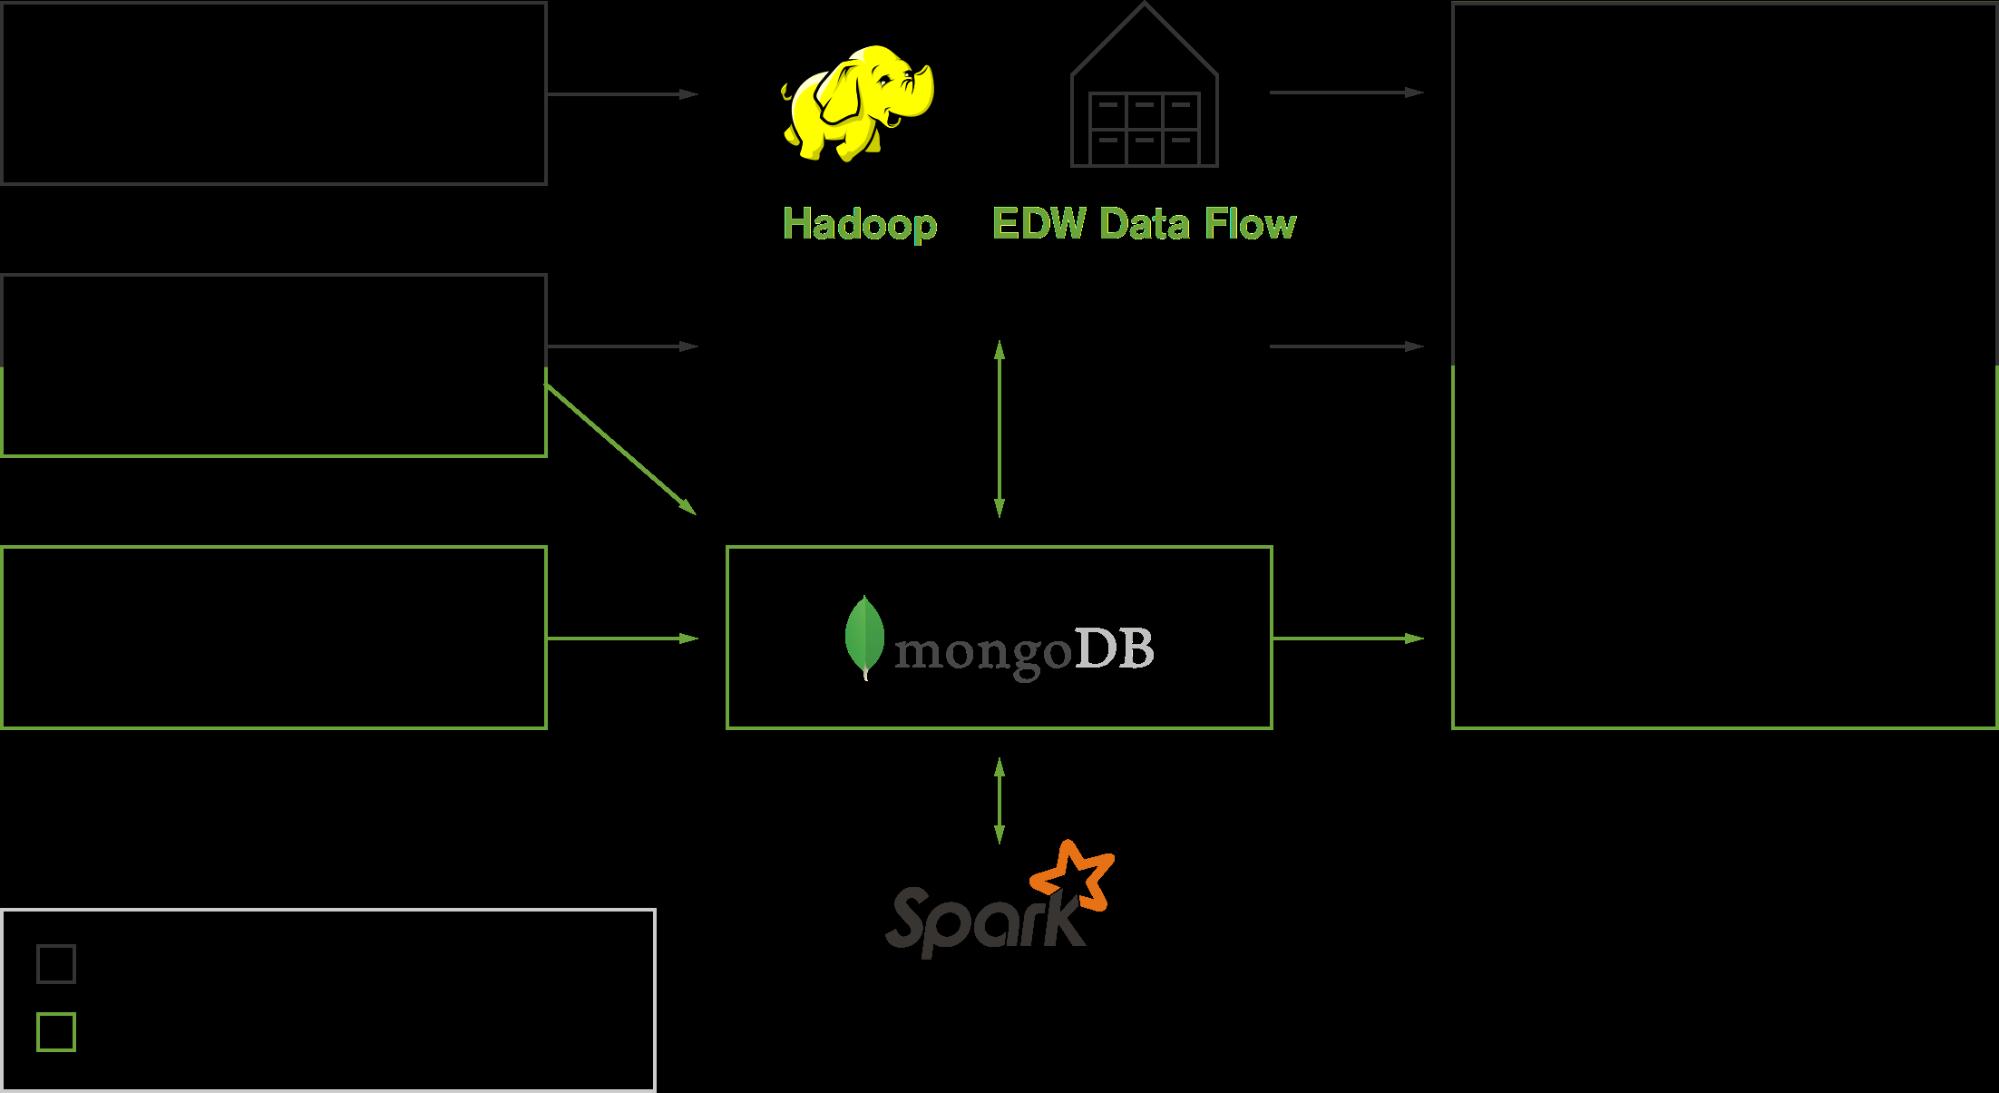 MongoDB Debuts in Gartner's Magic Quadrant for Data Warehouse & Data